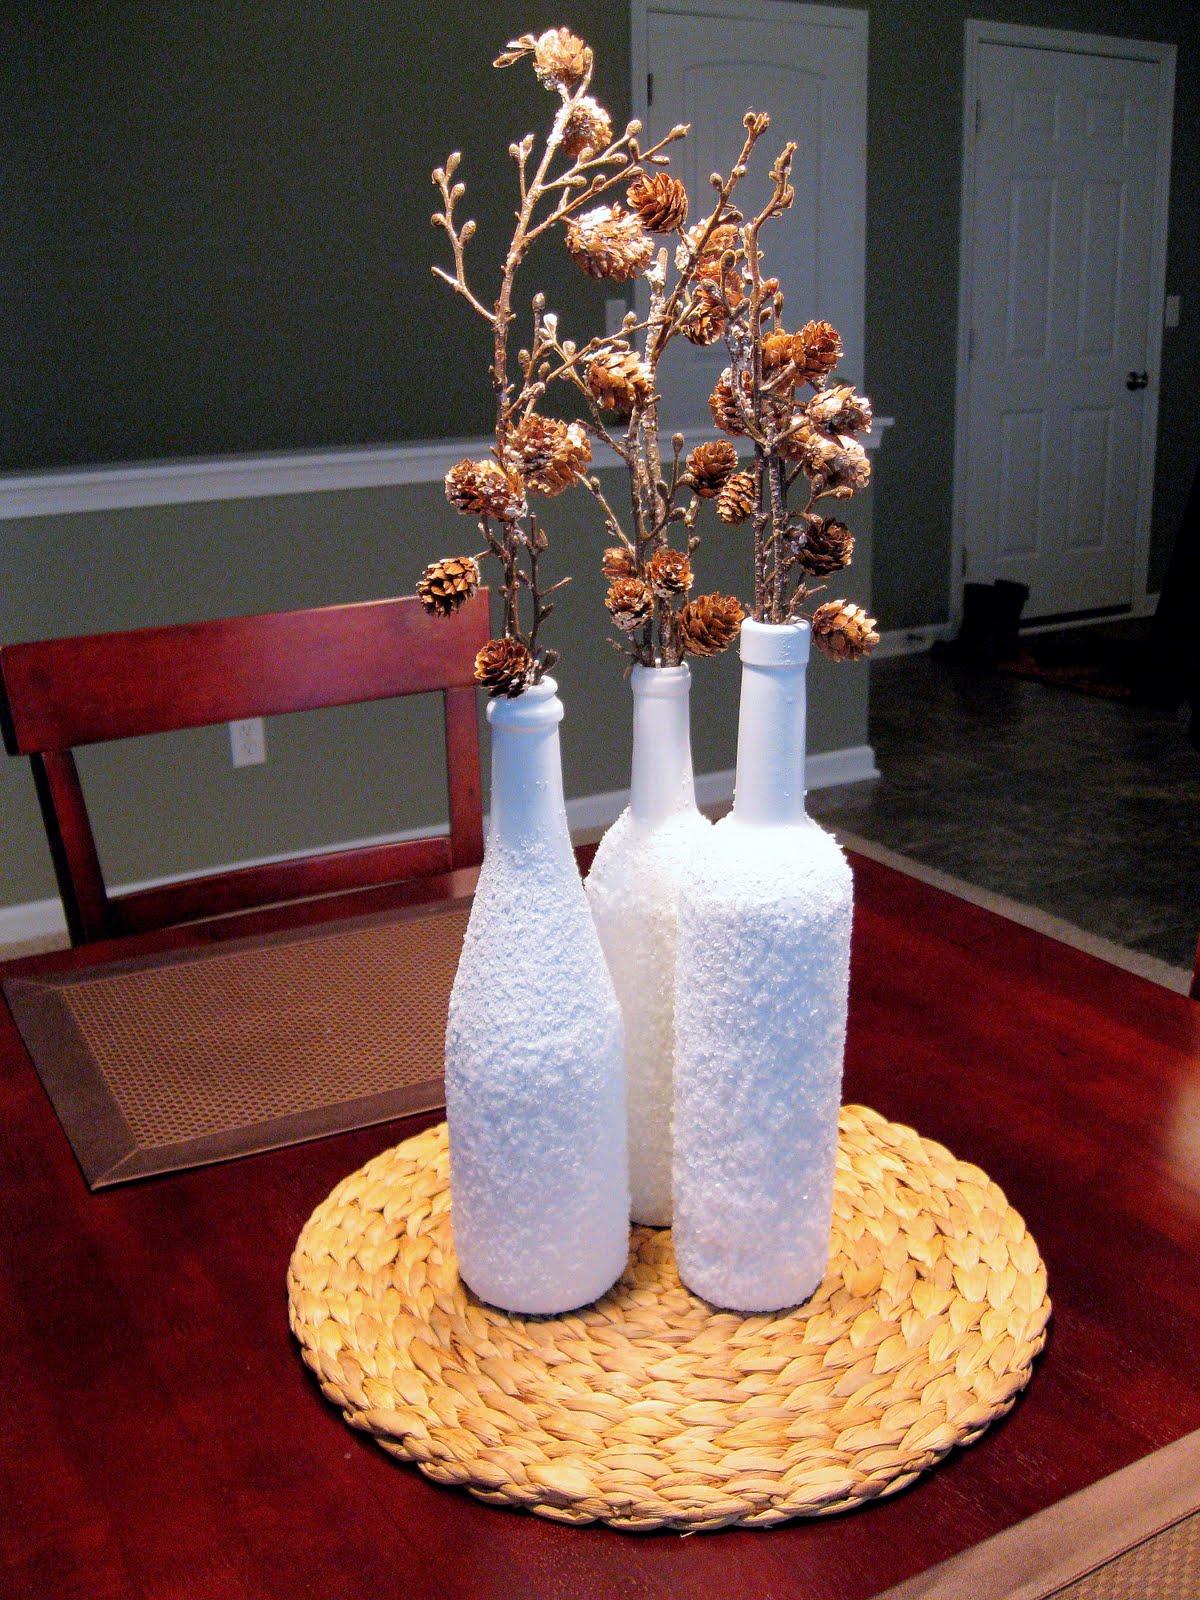 order of grace with a side of sass diy wine bottle christmas decor. Black Bedroom Furniture Sets. Home Design Ideas